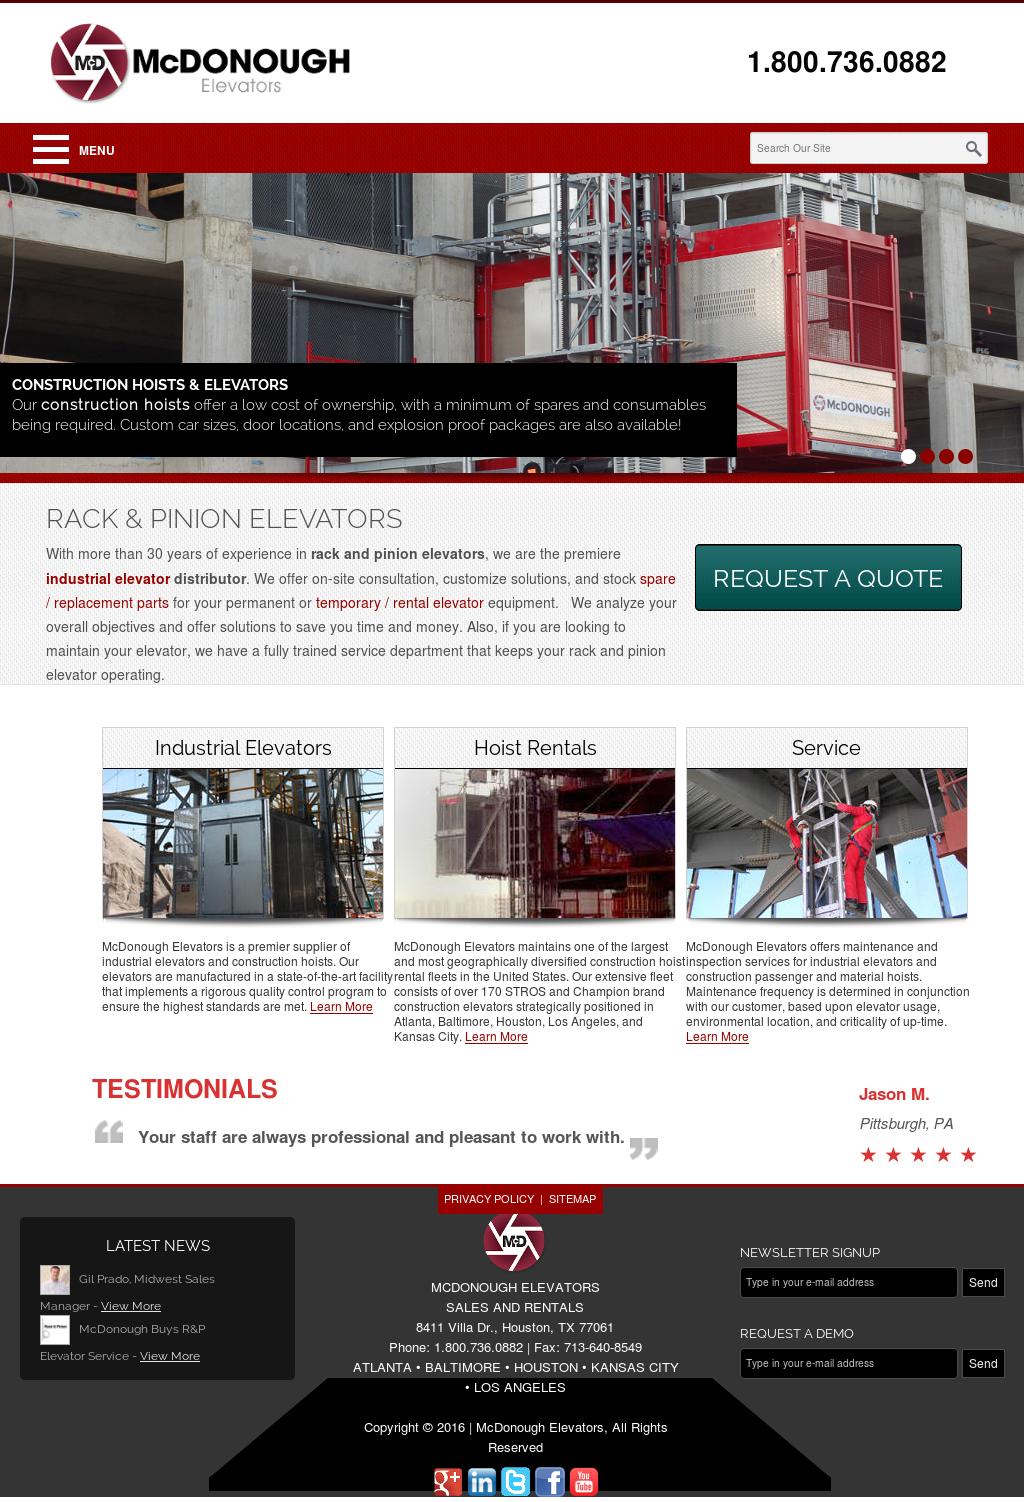 McDonough Elevators Competitors, Revenue and Employees